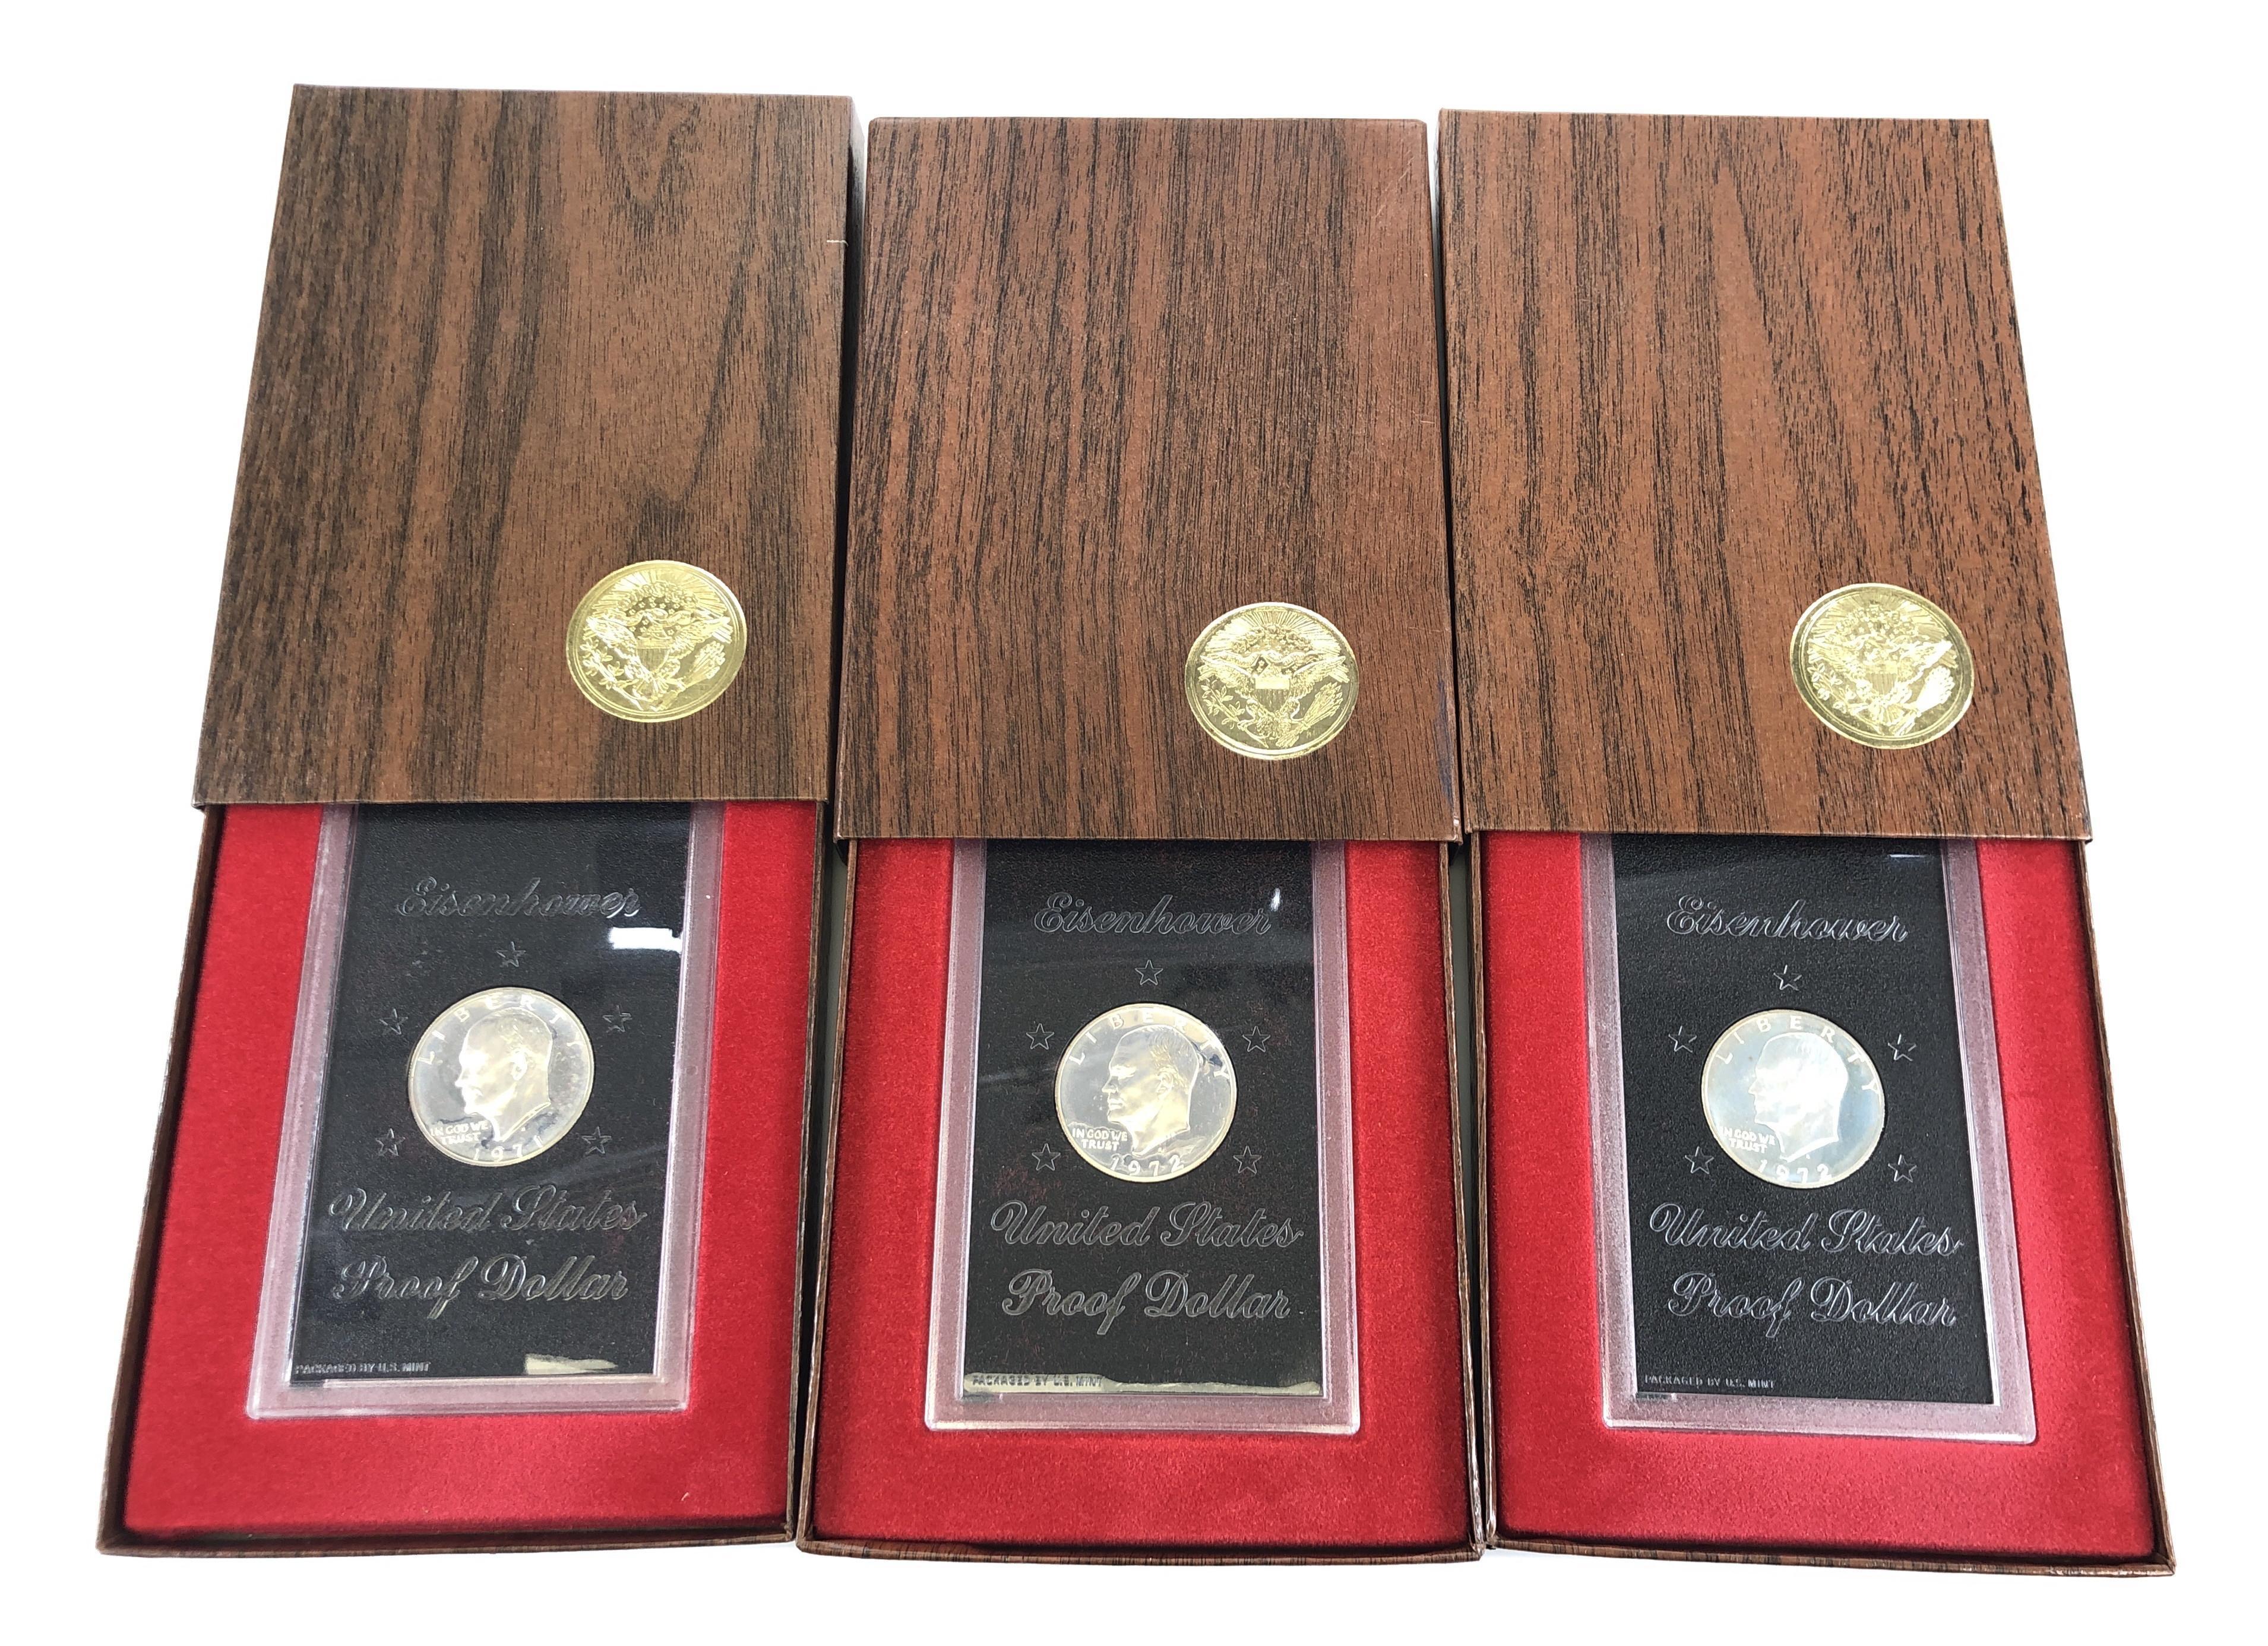 LOT OF 3 1971-1972 U.S. EISENHOWER DOLLAR